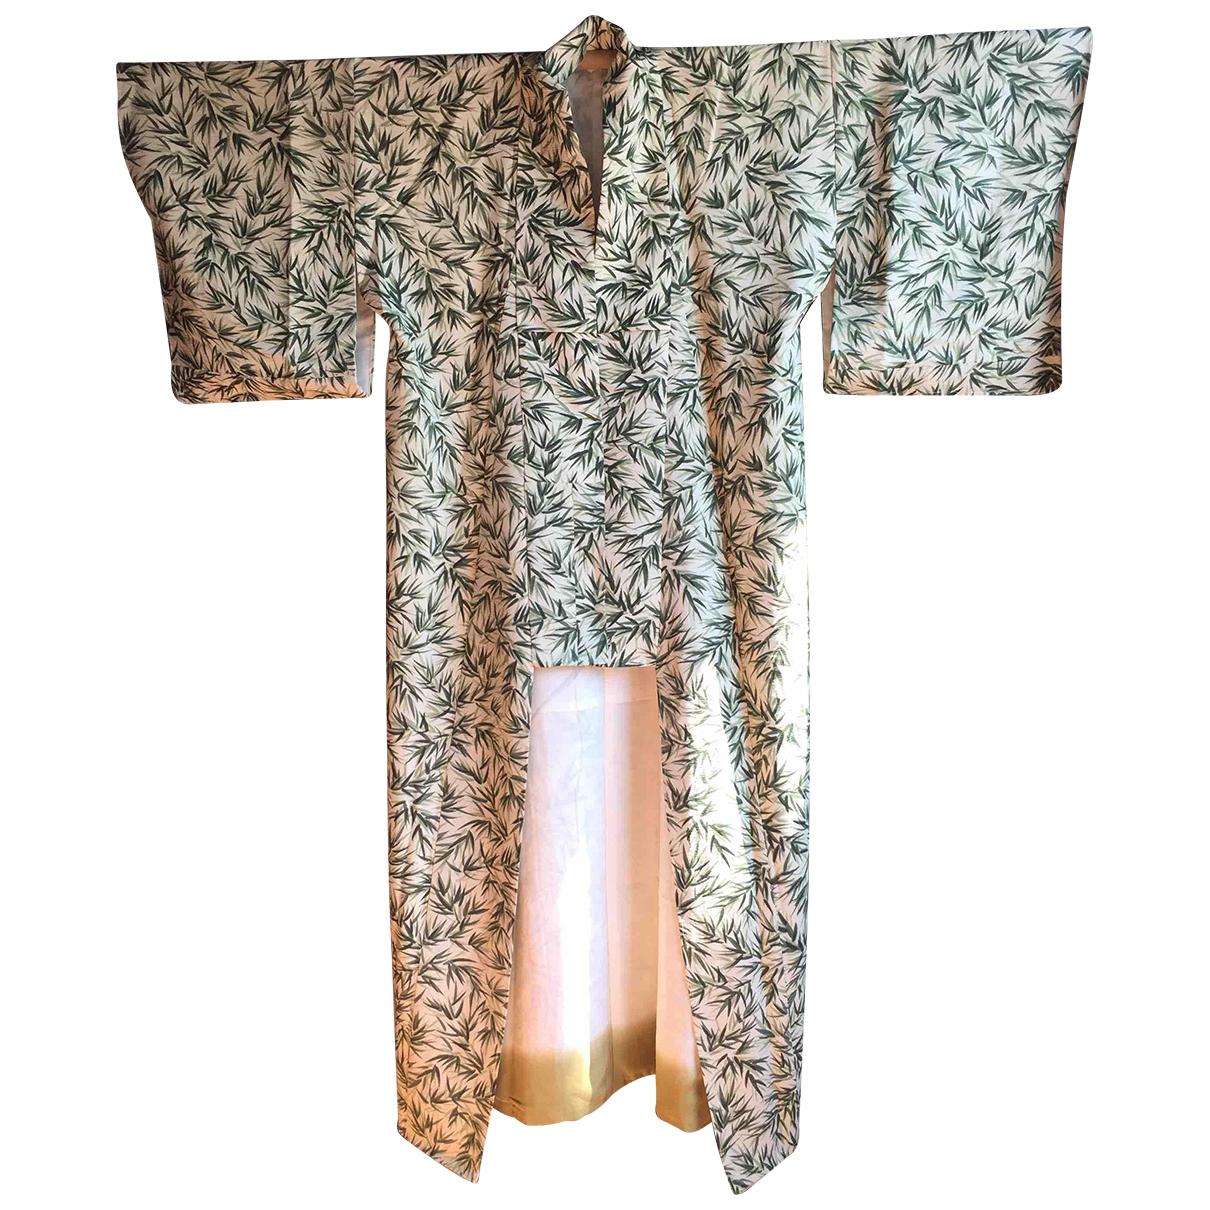 Textil de hogar de Seda Non Signe / Unsigned